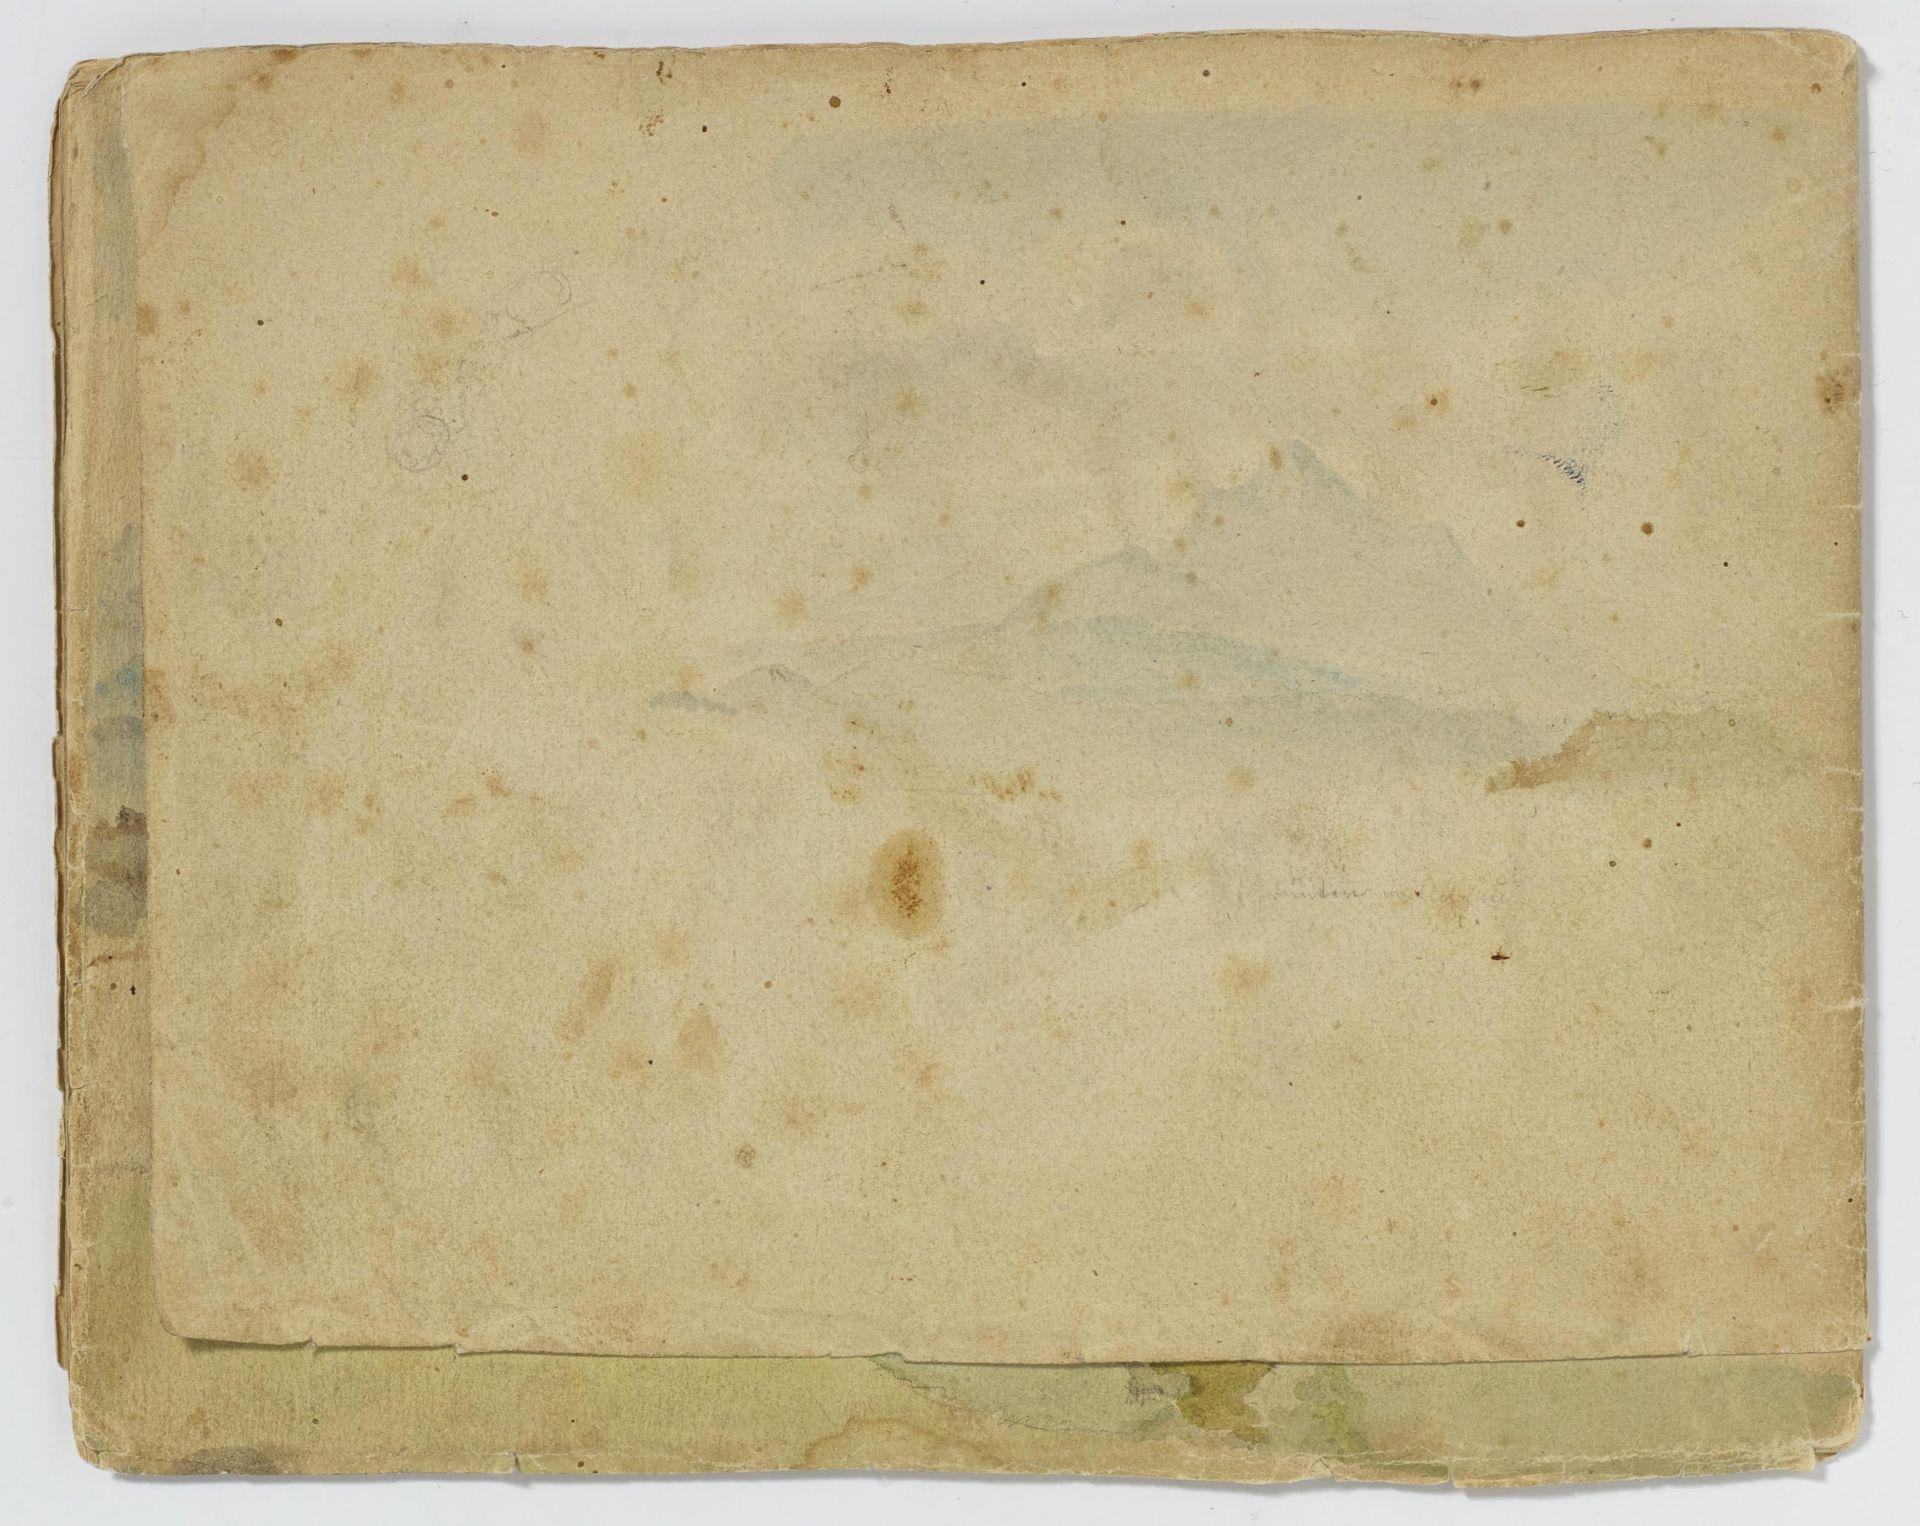 Kaupert, Gustav Kassel 1819 - 1897  Sketchbook, two booklets, each ca. 17 pages. Architectural - Bild 6 aus 8